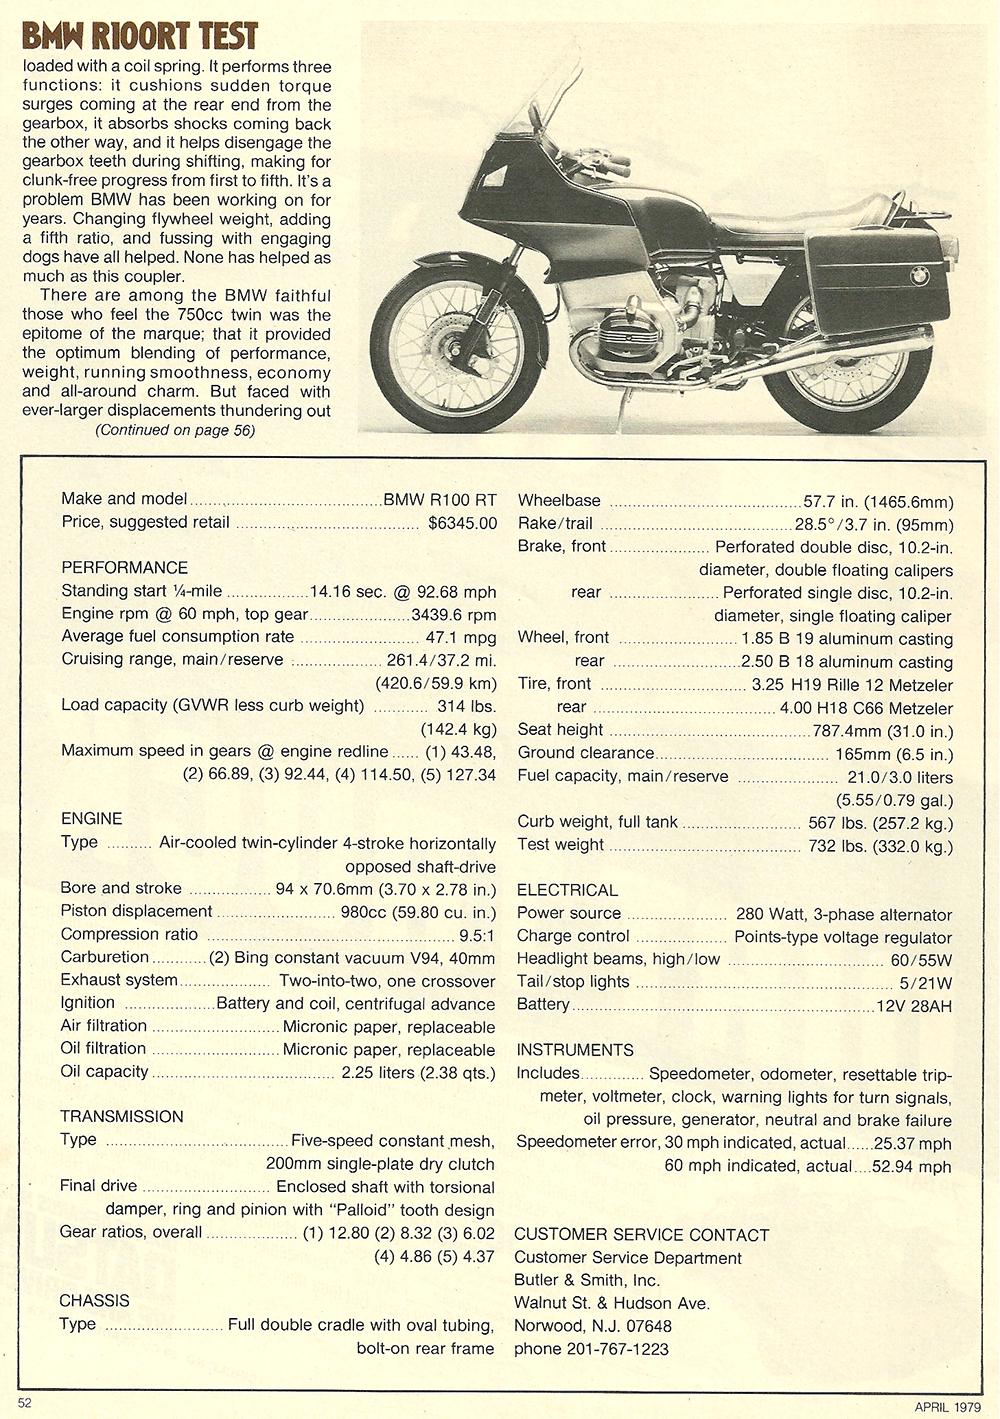 1979 BMW R100RT road test 08.jpg